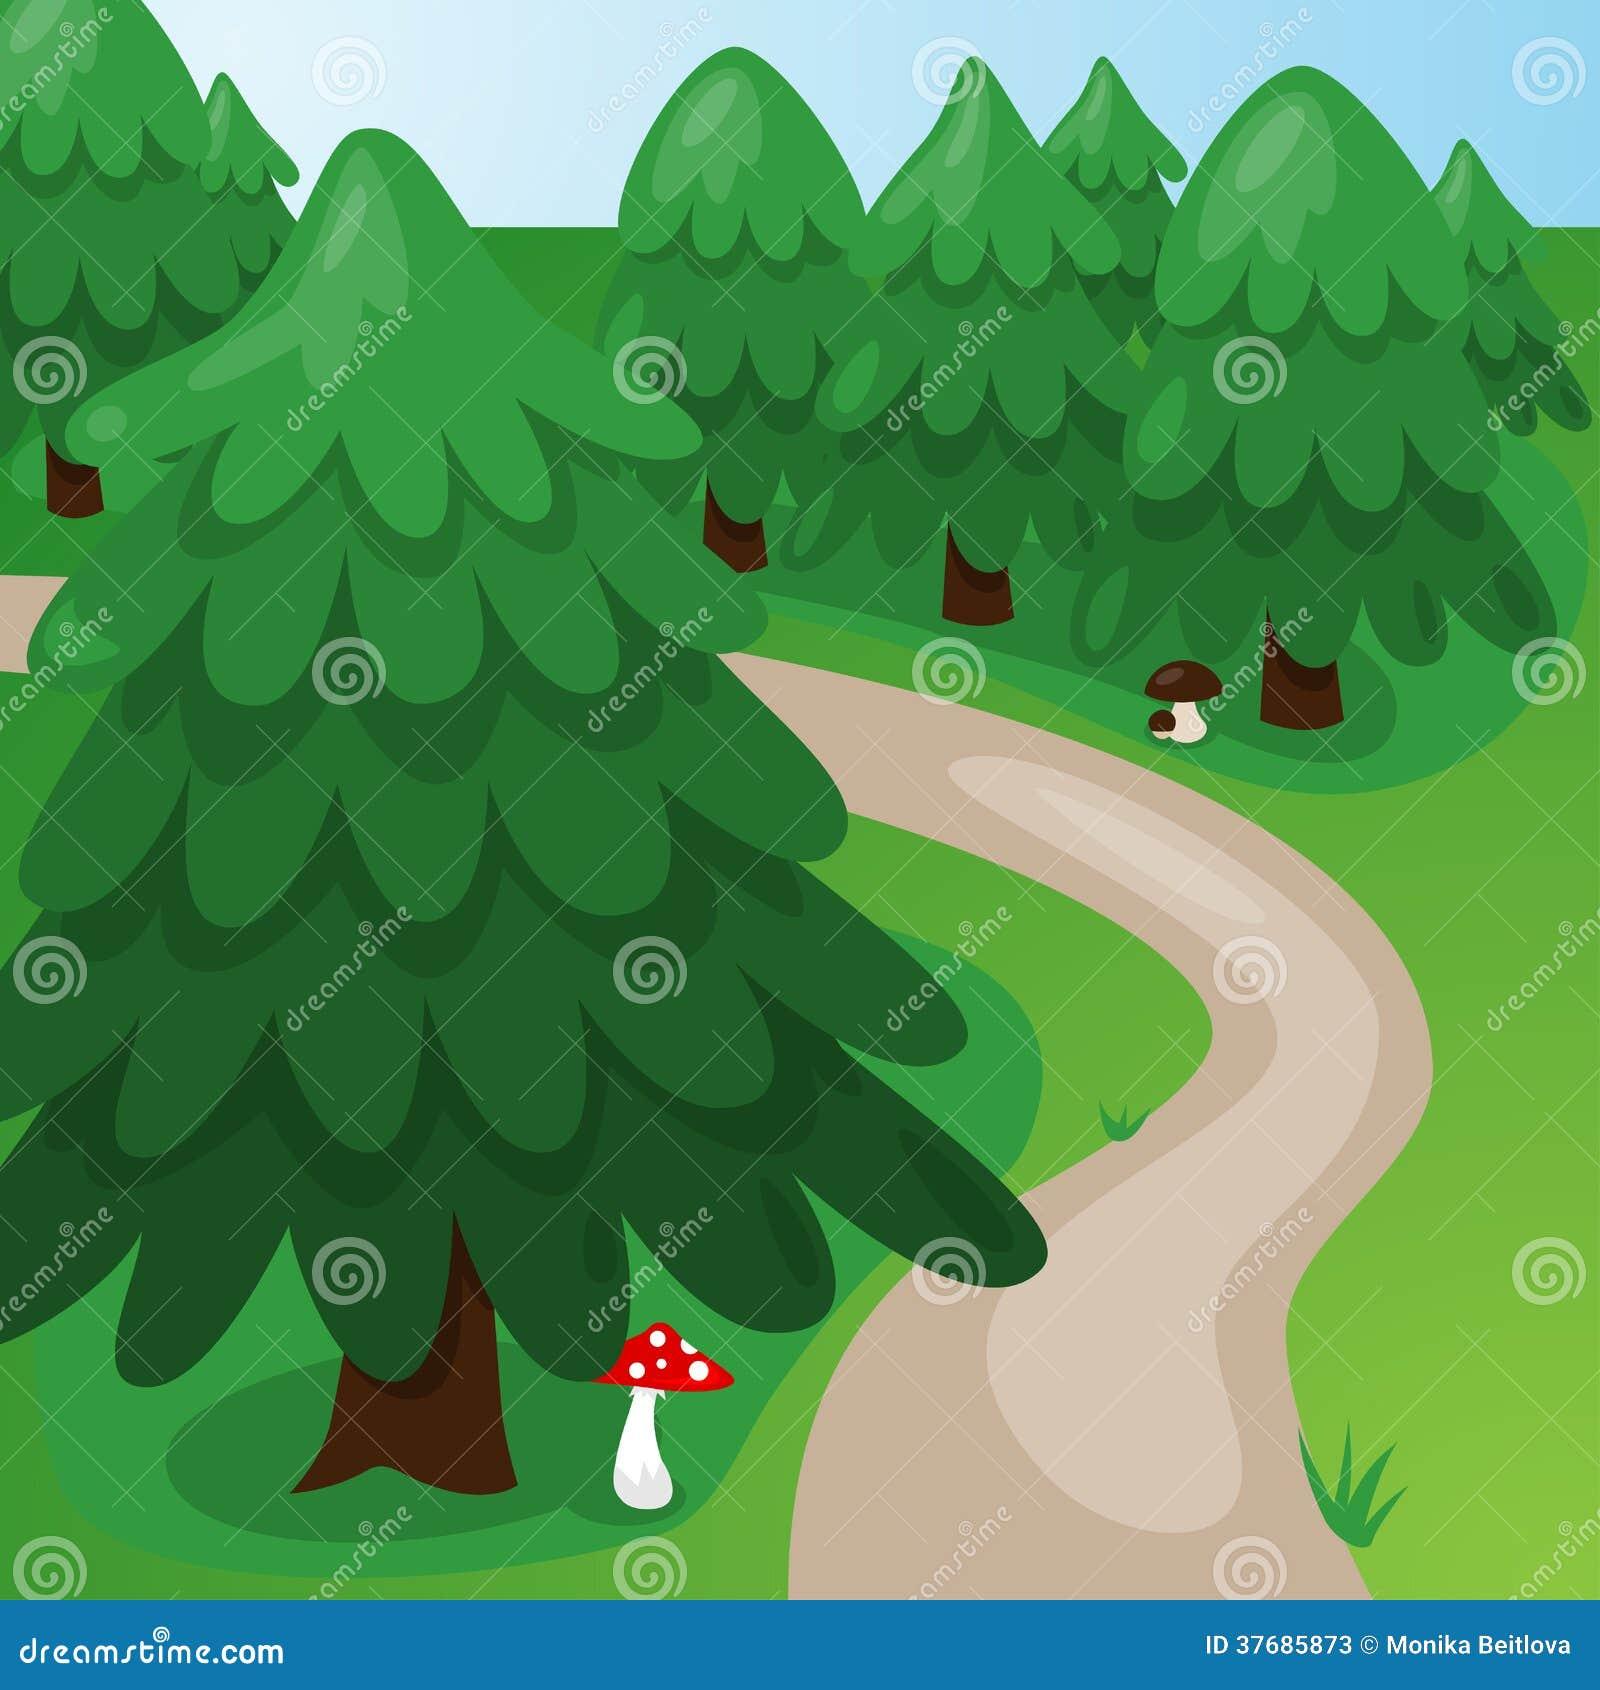 Cartoon Forest Background Stock Photos - Image: 37685873